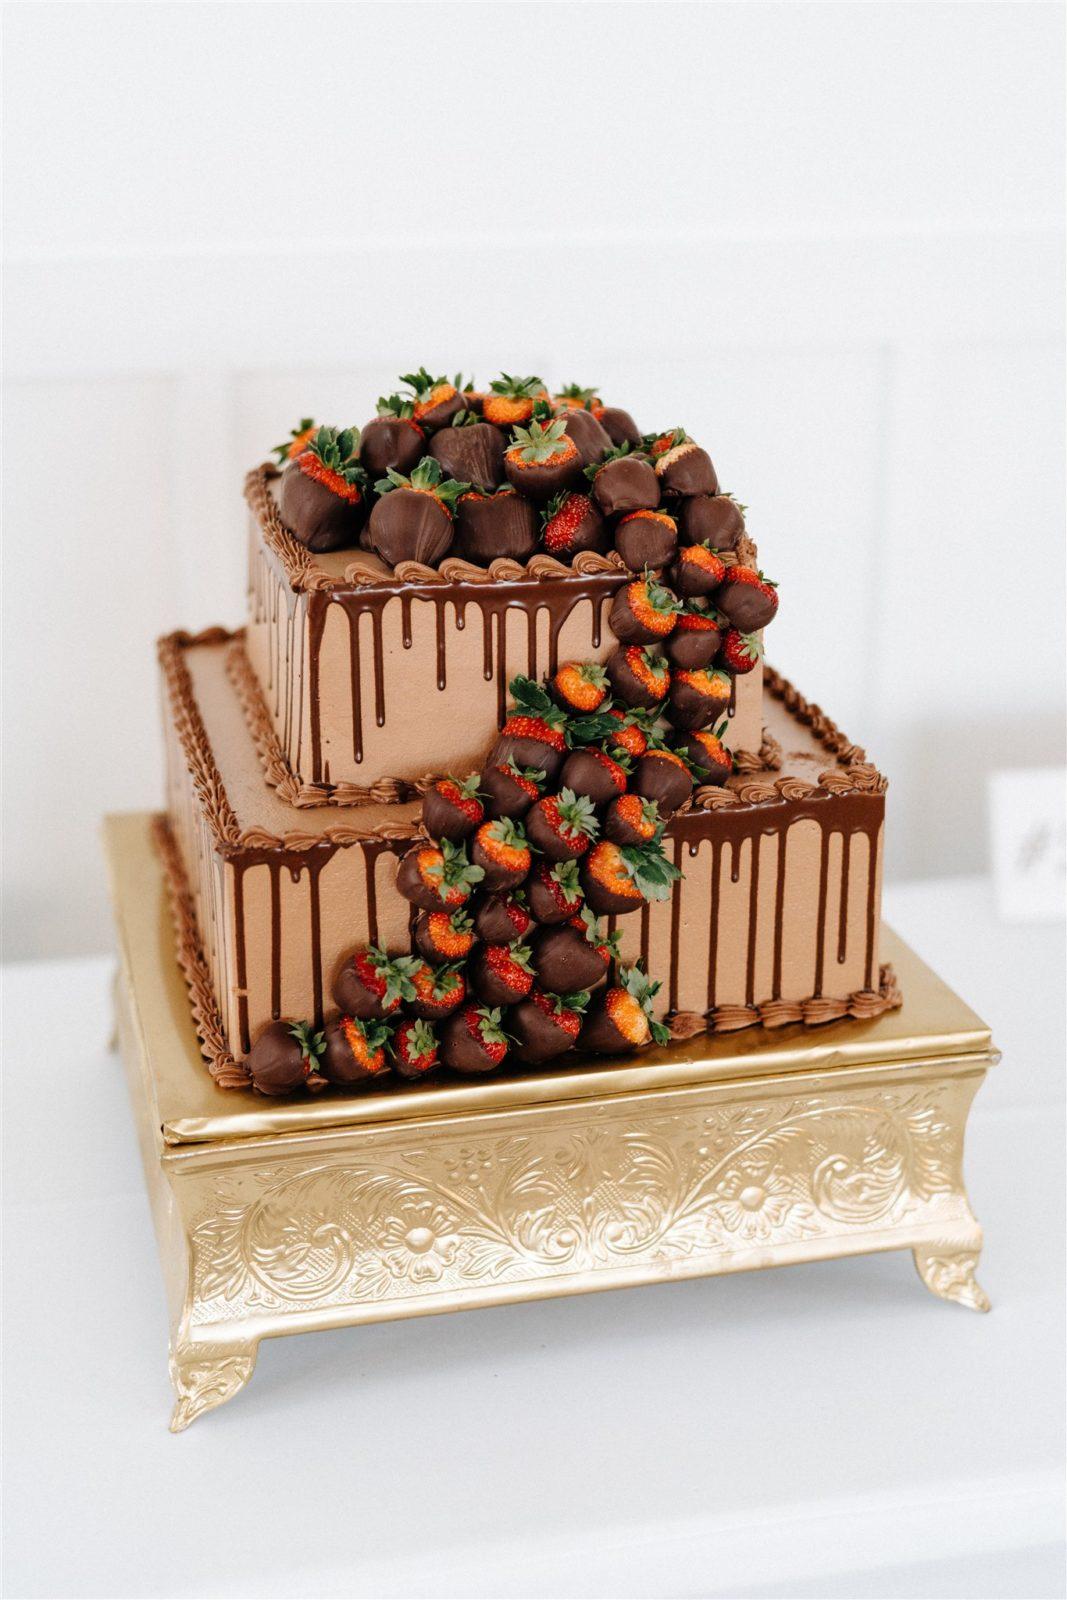 Chocolate Strawberry Wedding Cake: Simply Modern Firefly Gardens Wedding featured on Alexa Kay Events